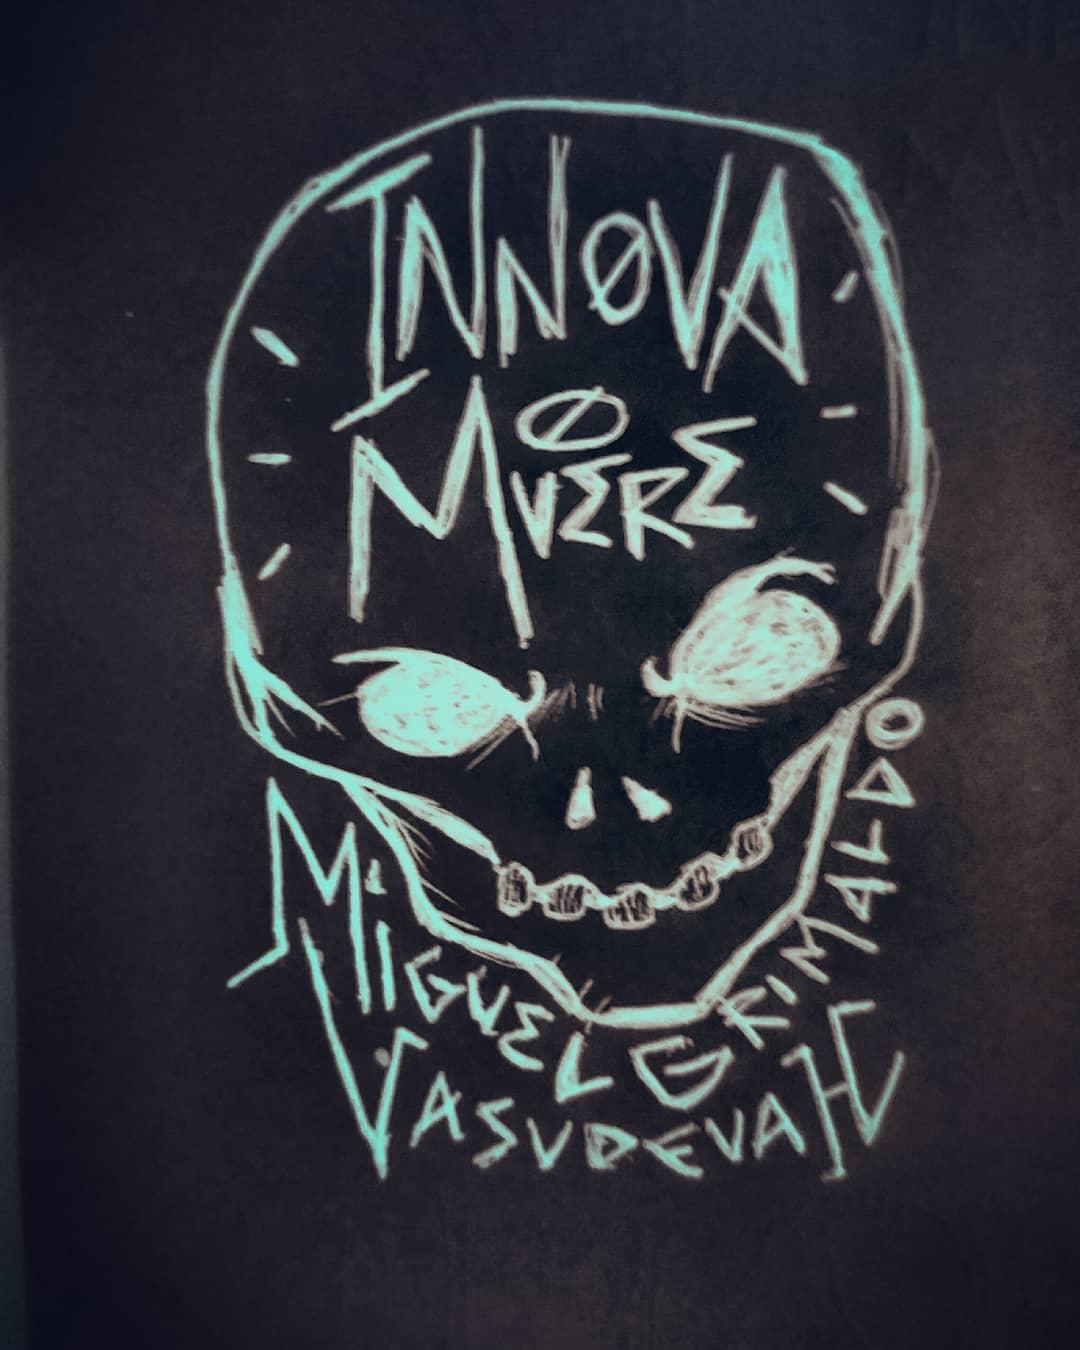 Innova_o_muere